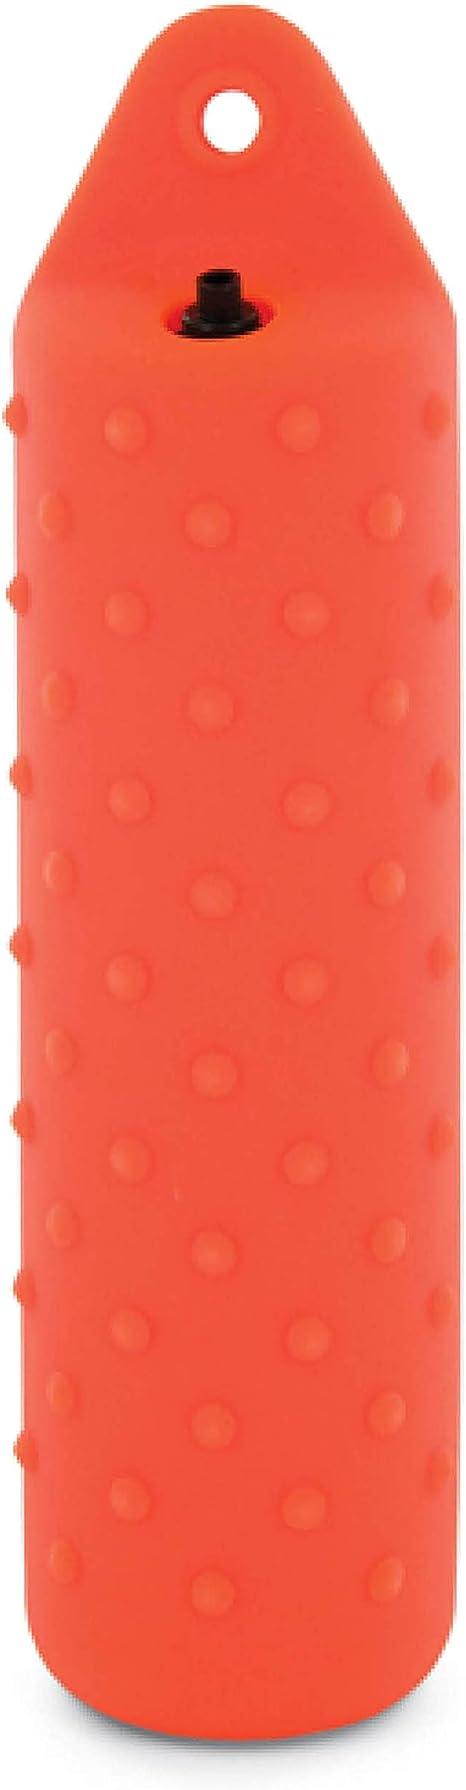 SportDOG 3 Genuine JUMBO Plastic FREE-BPA Dummy Orange B/&W /& White Sporting Dog